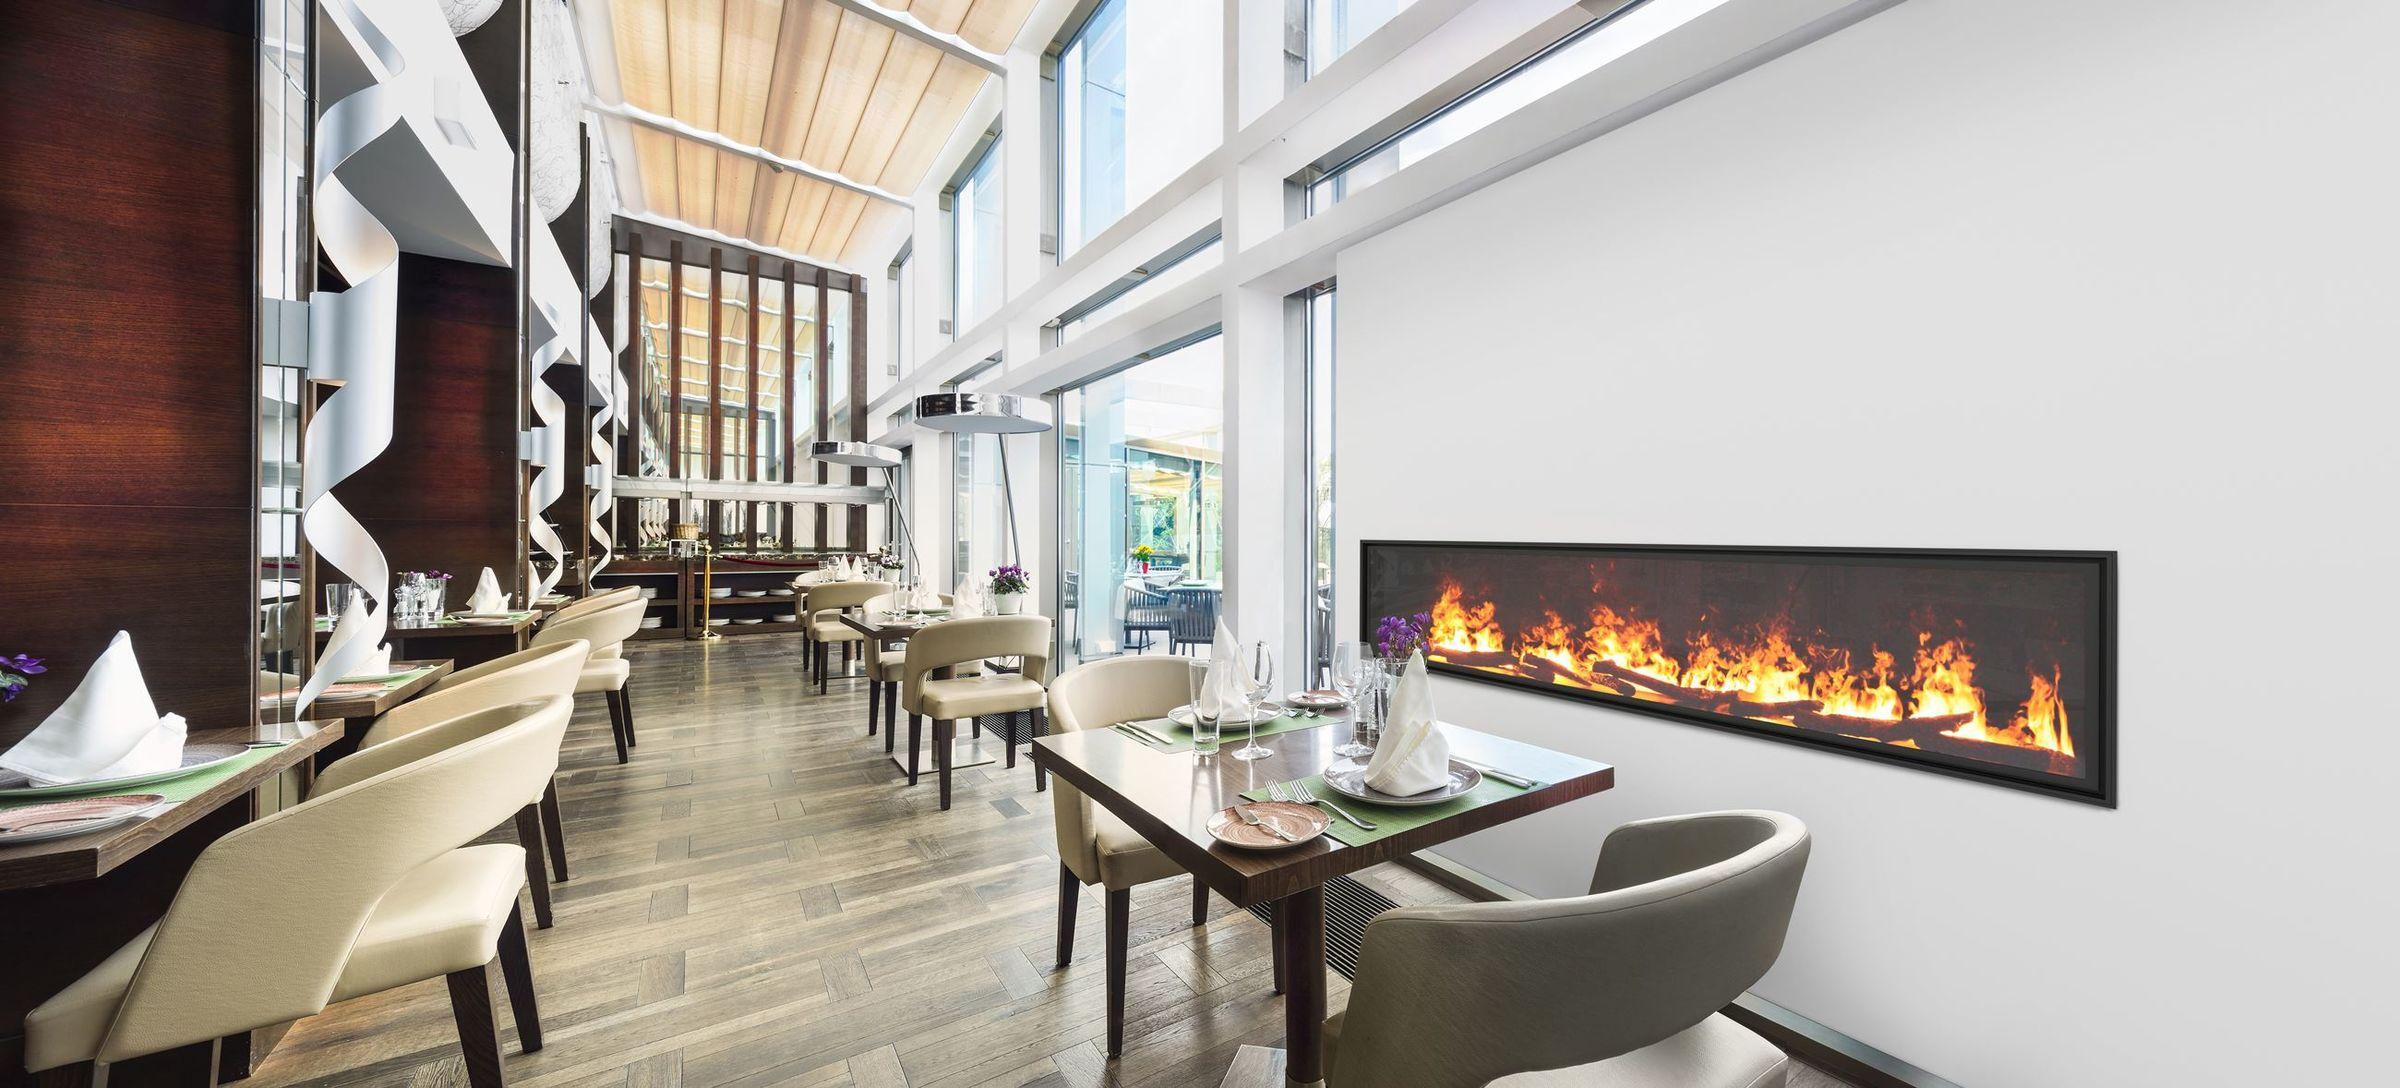 96 Inch Single-Sided | Built-In Linear Vapor-Fire Fireplace